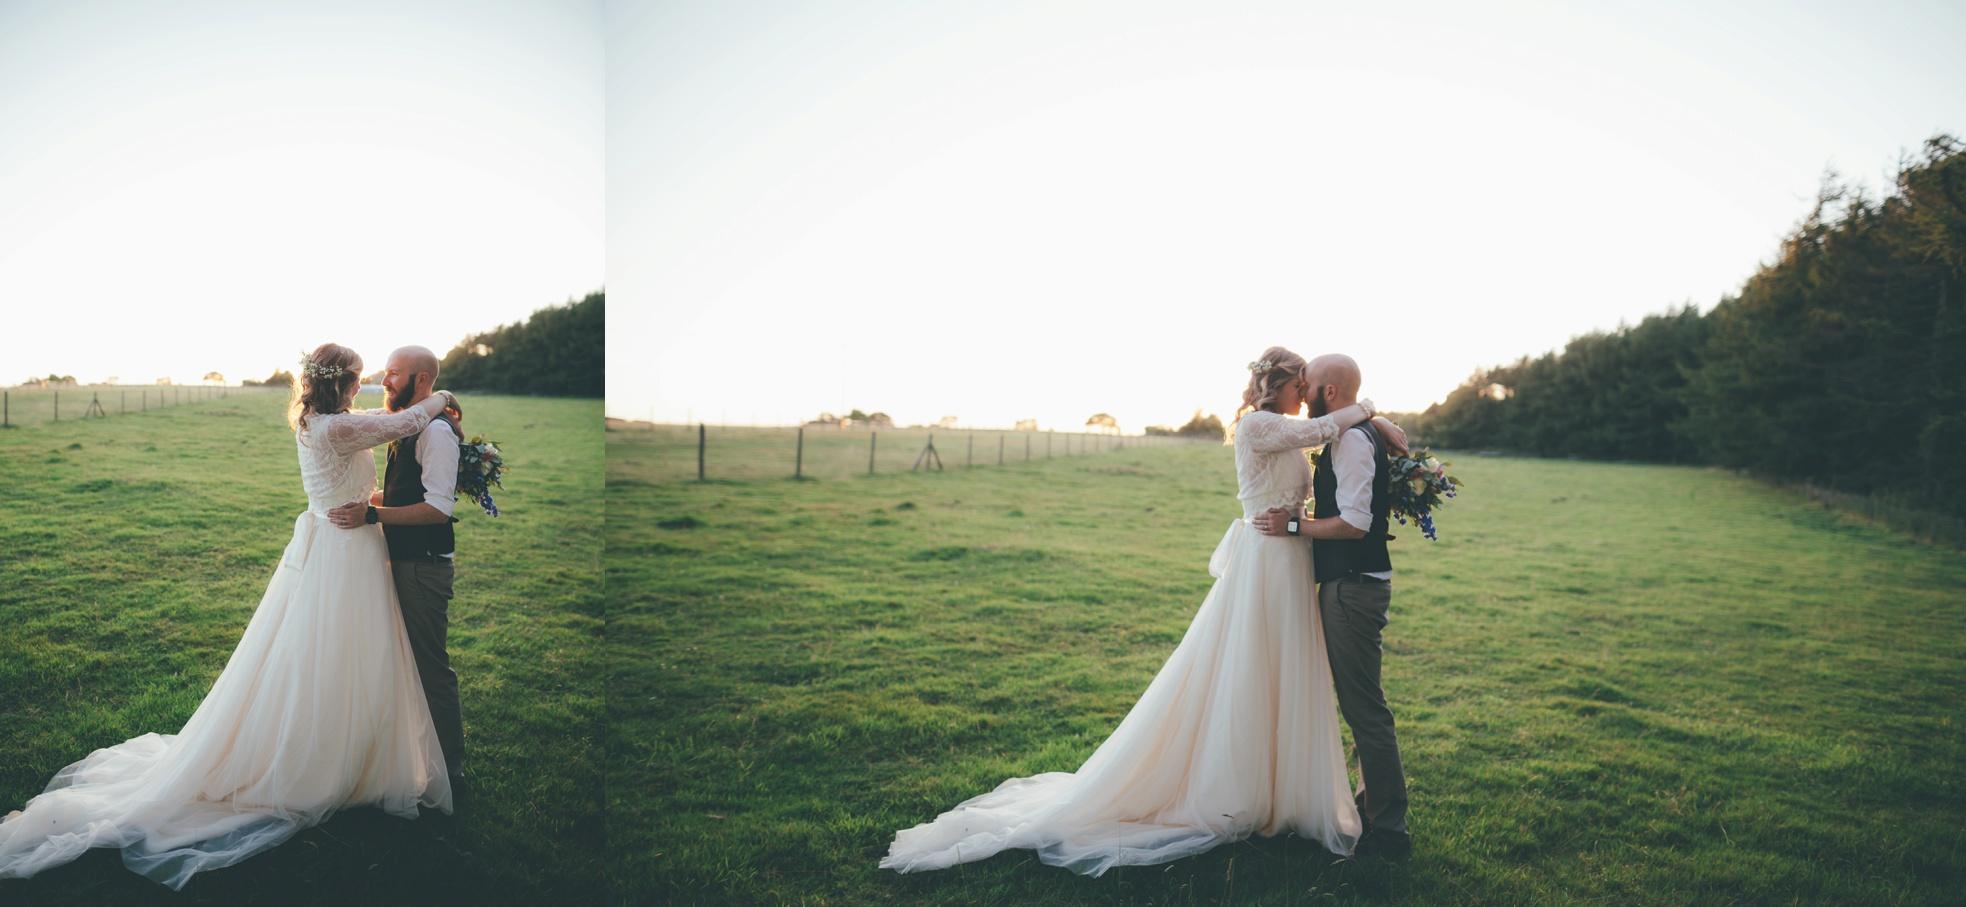 Matt&Mayme_LinehamFarmLeeds_0045.jpg